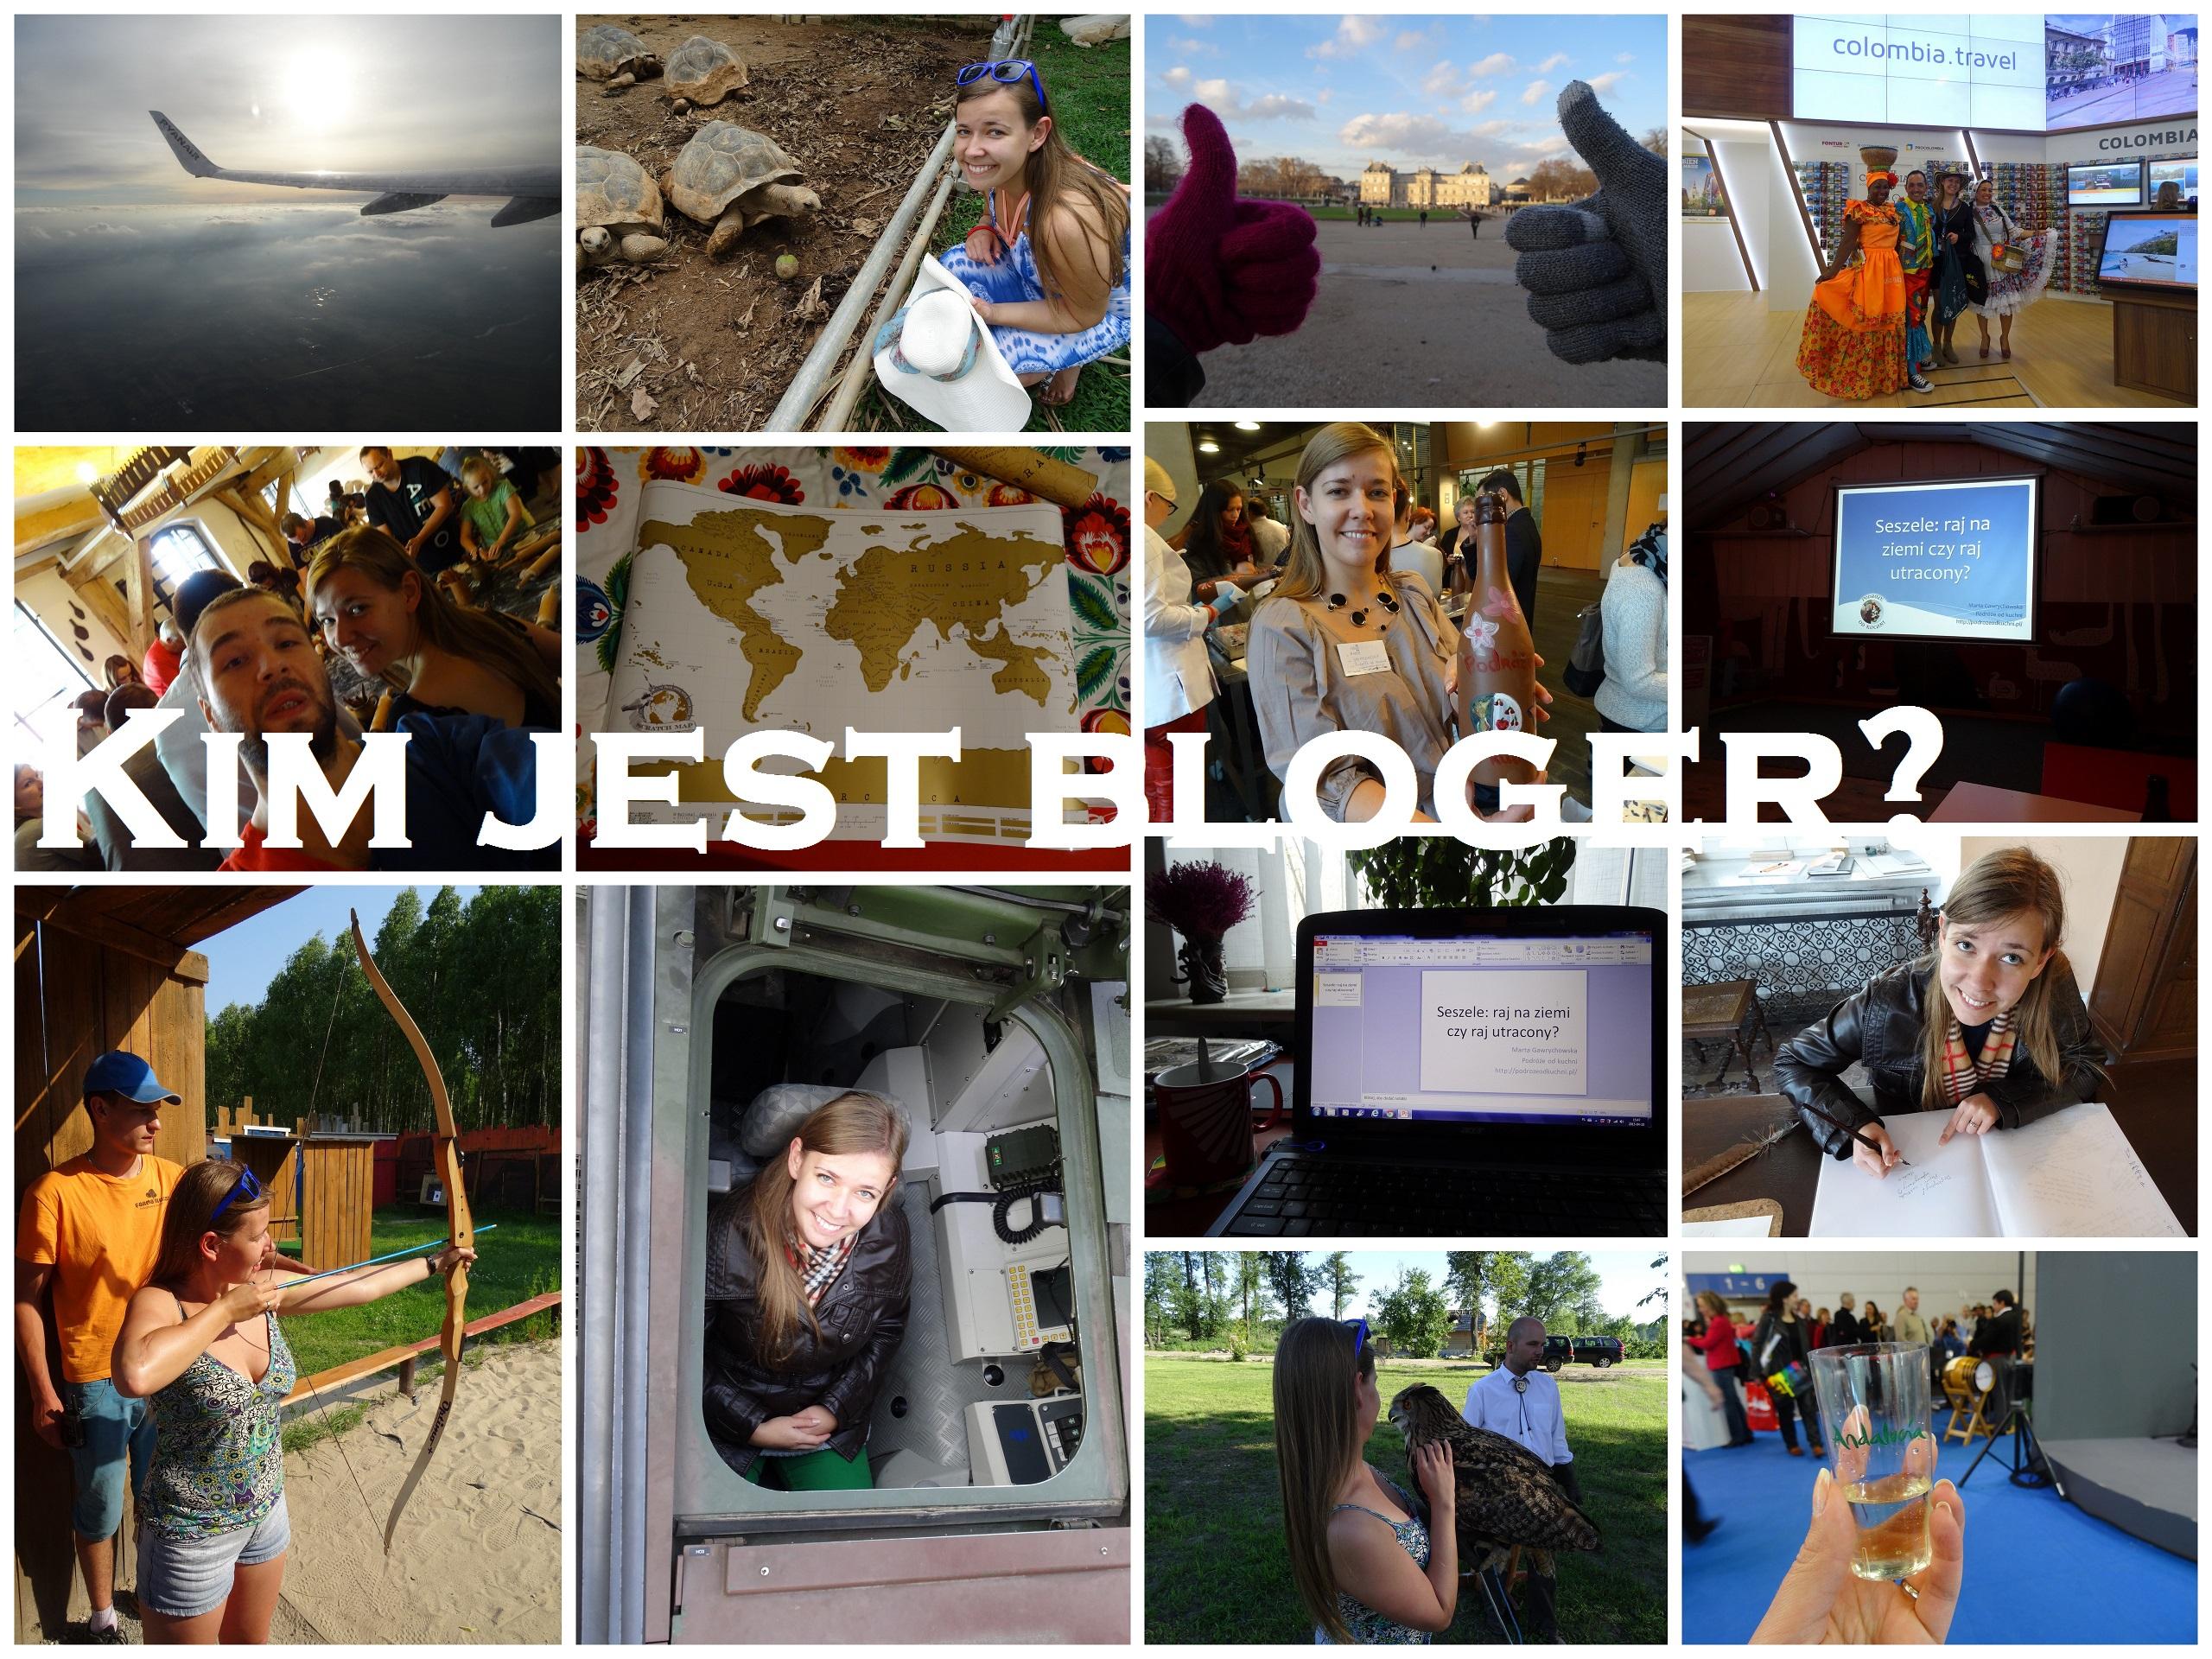 Miks bloger